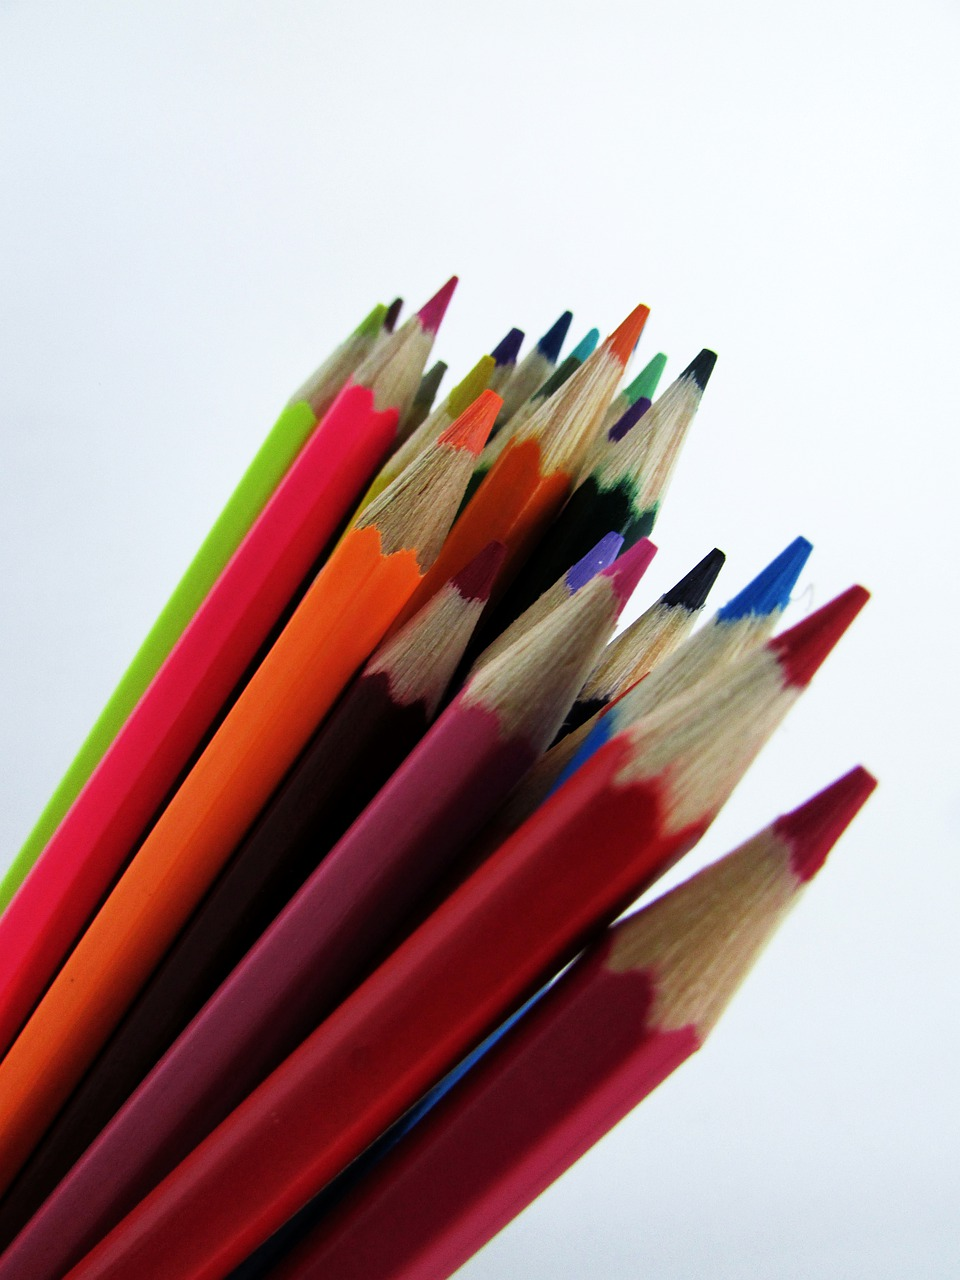 pencil-5048476-1280.jpg